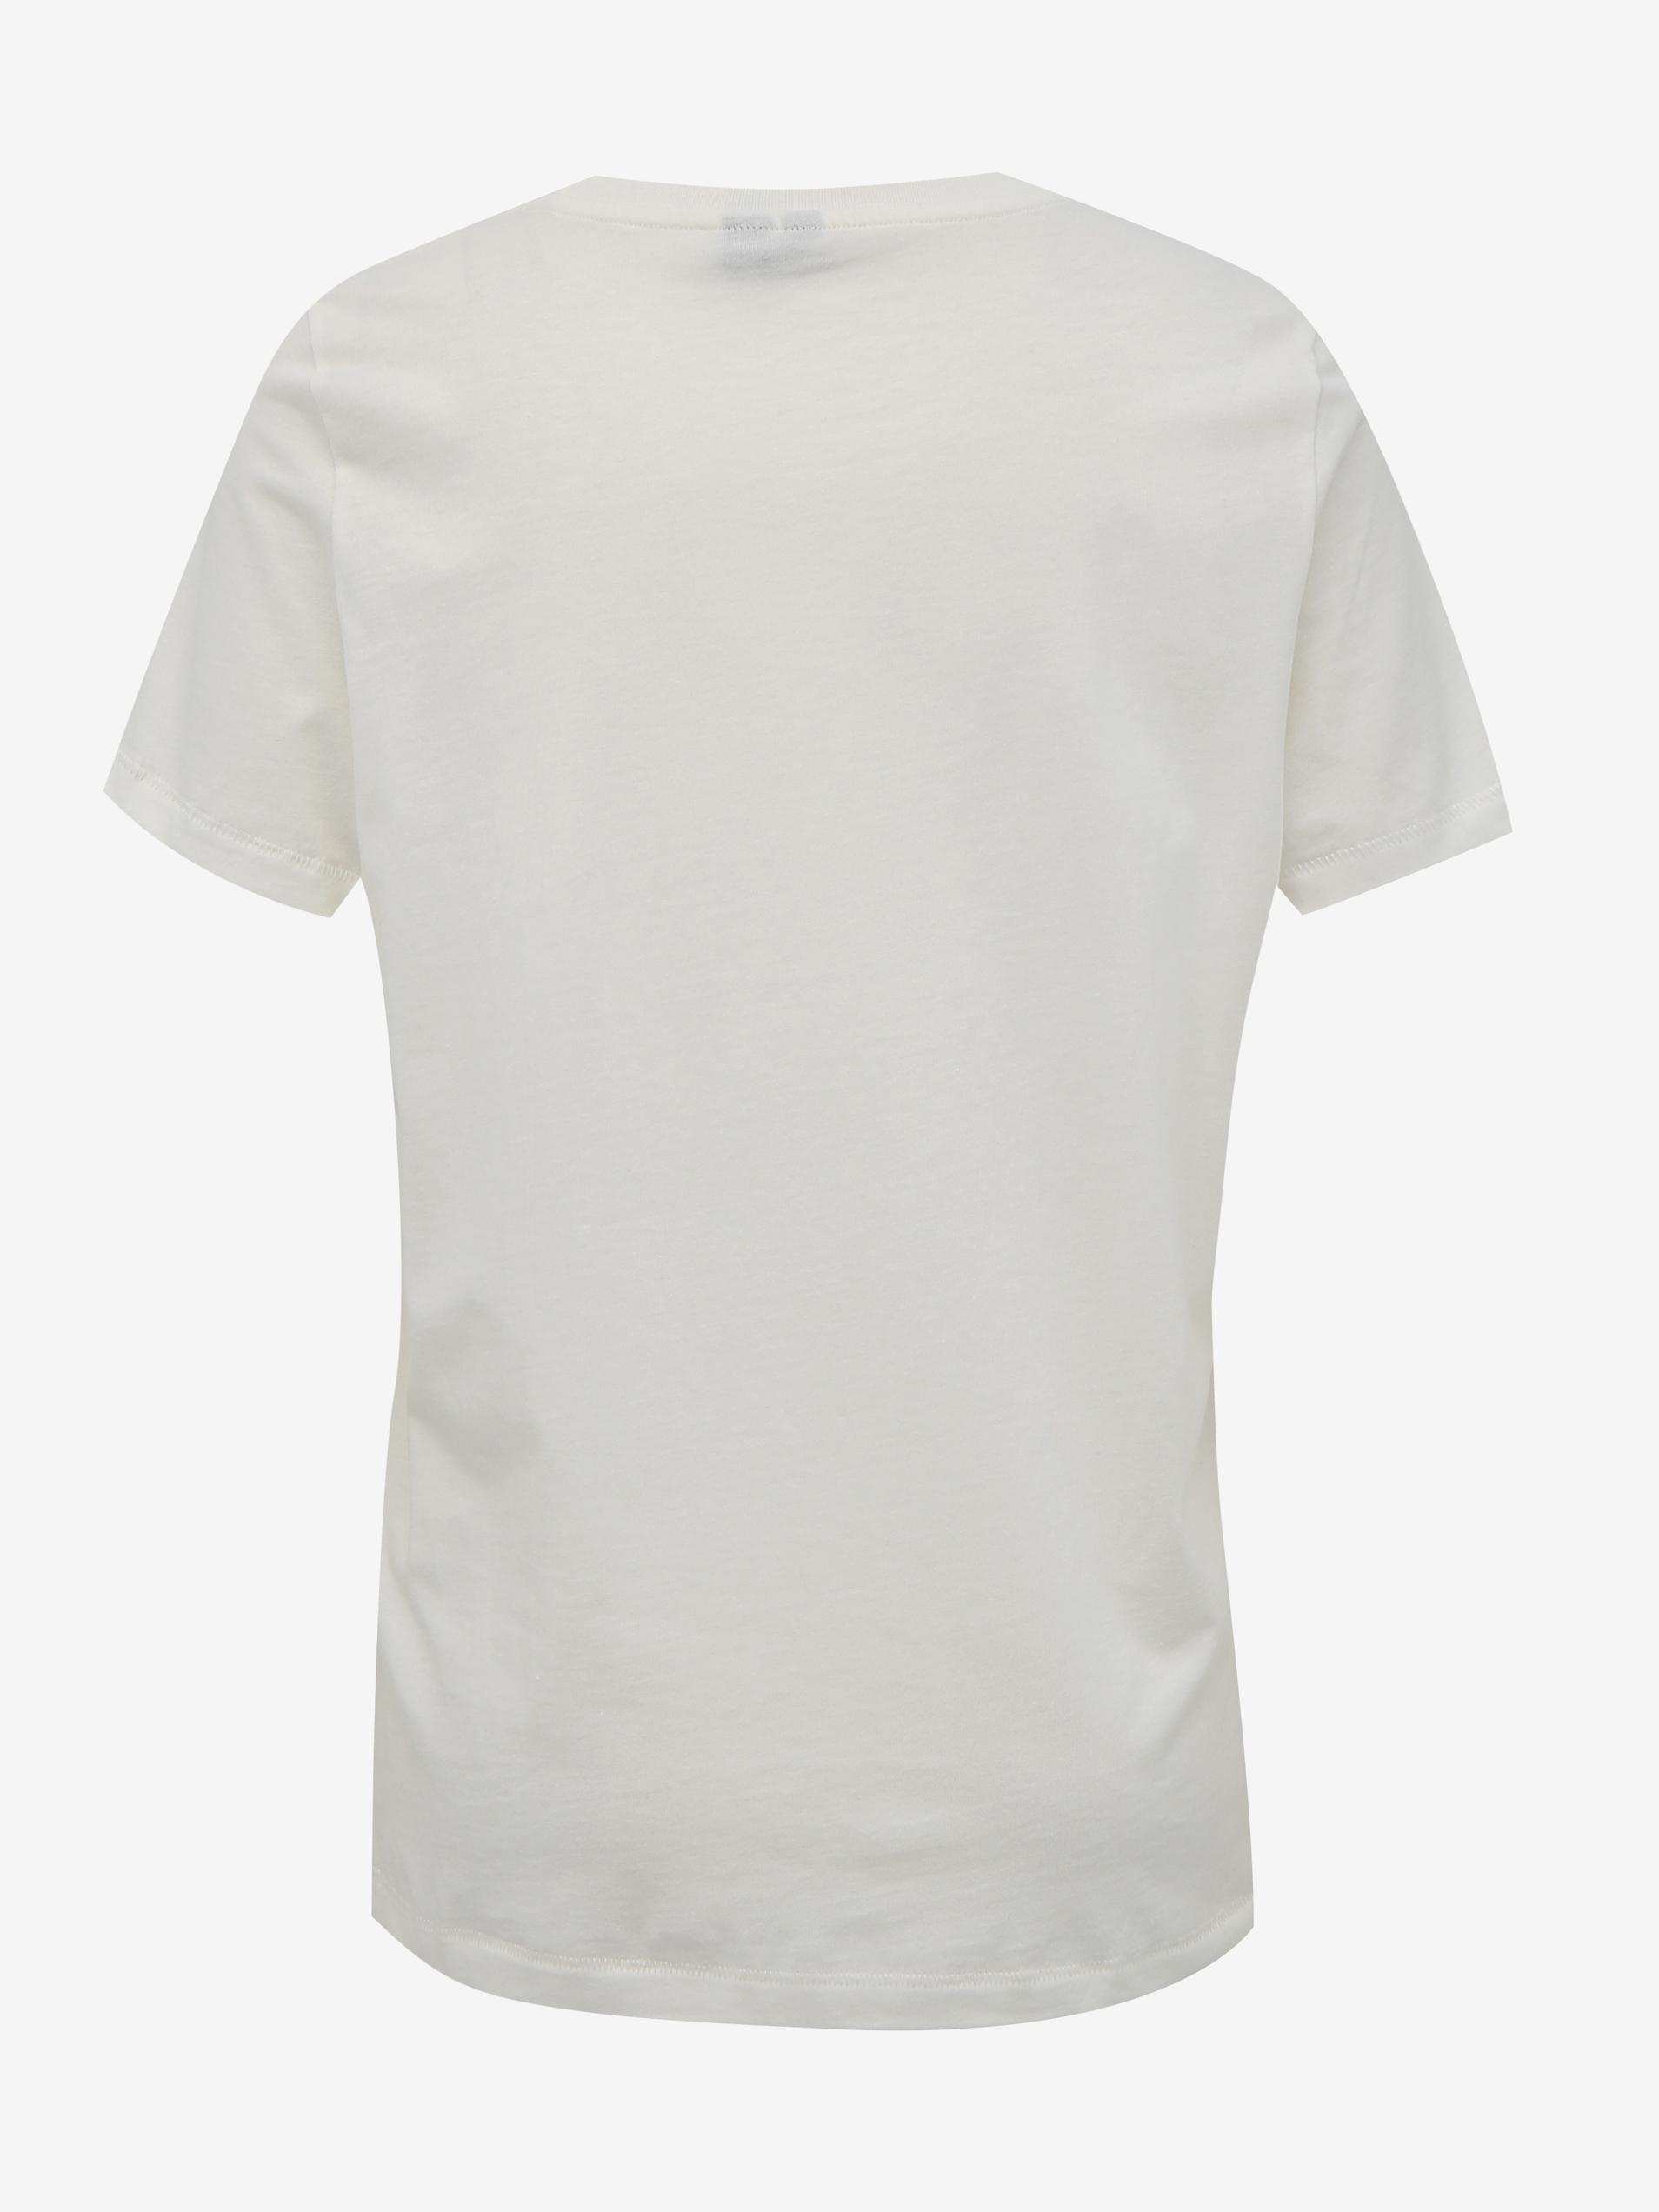 Vero Moda bijela majica Desert s tiskom